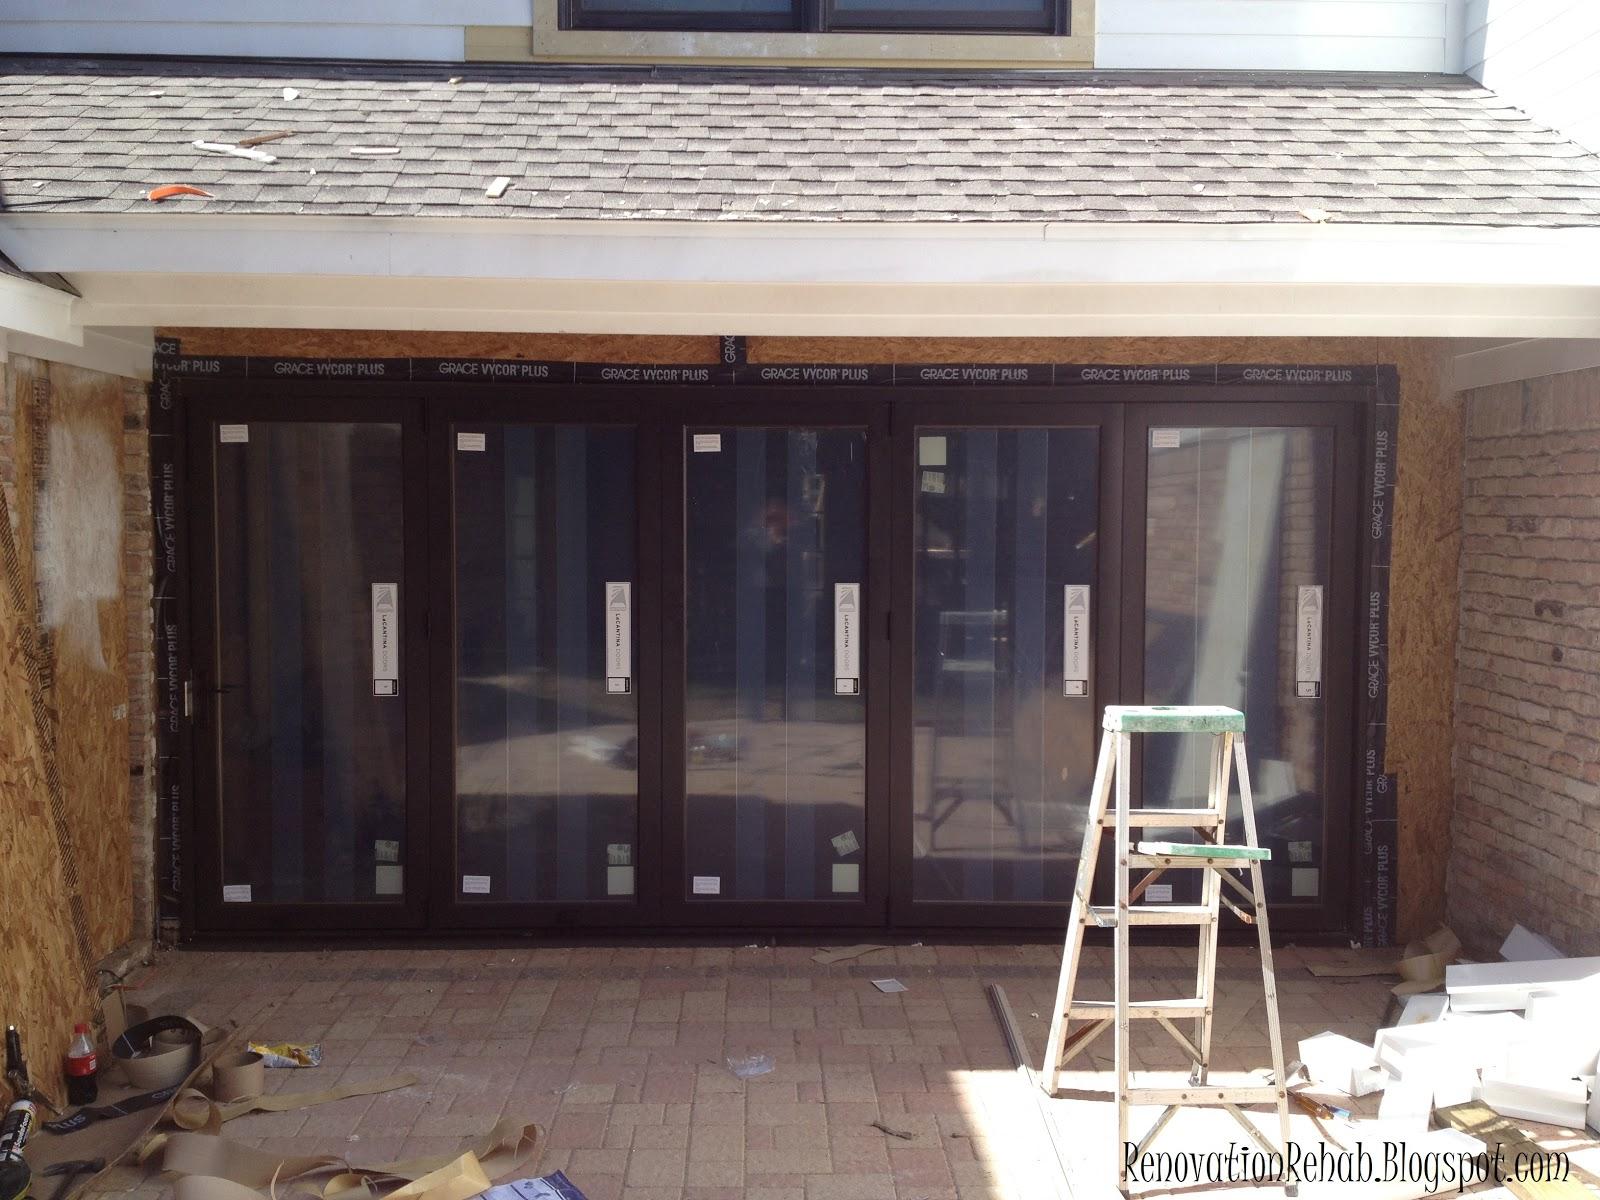 Houston We Have Drywall (u0026 a LaCantina Door)! & Renovation Rehab: Houston We Have Drywall (u0026 a LaCantina Door)! pezcame.com